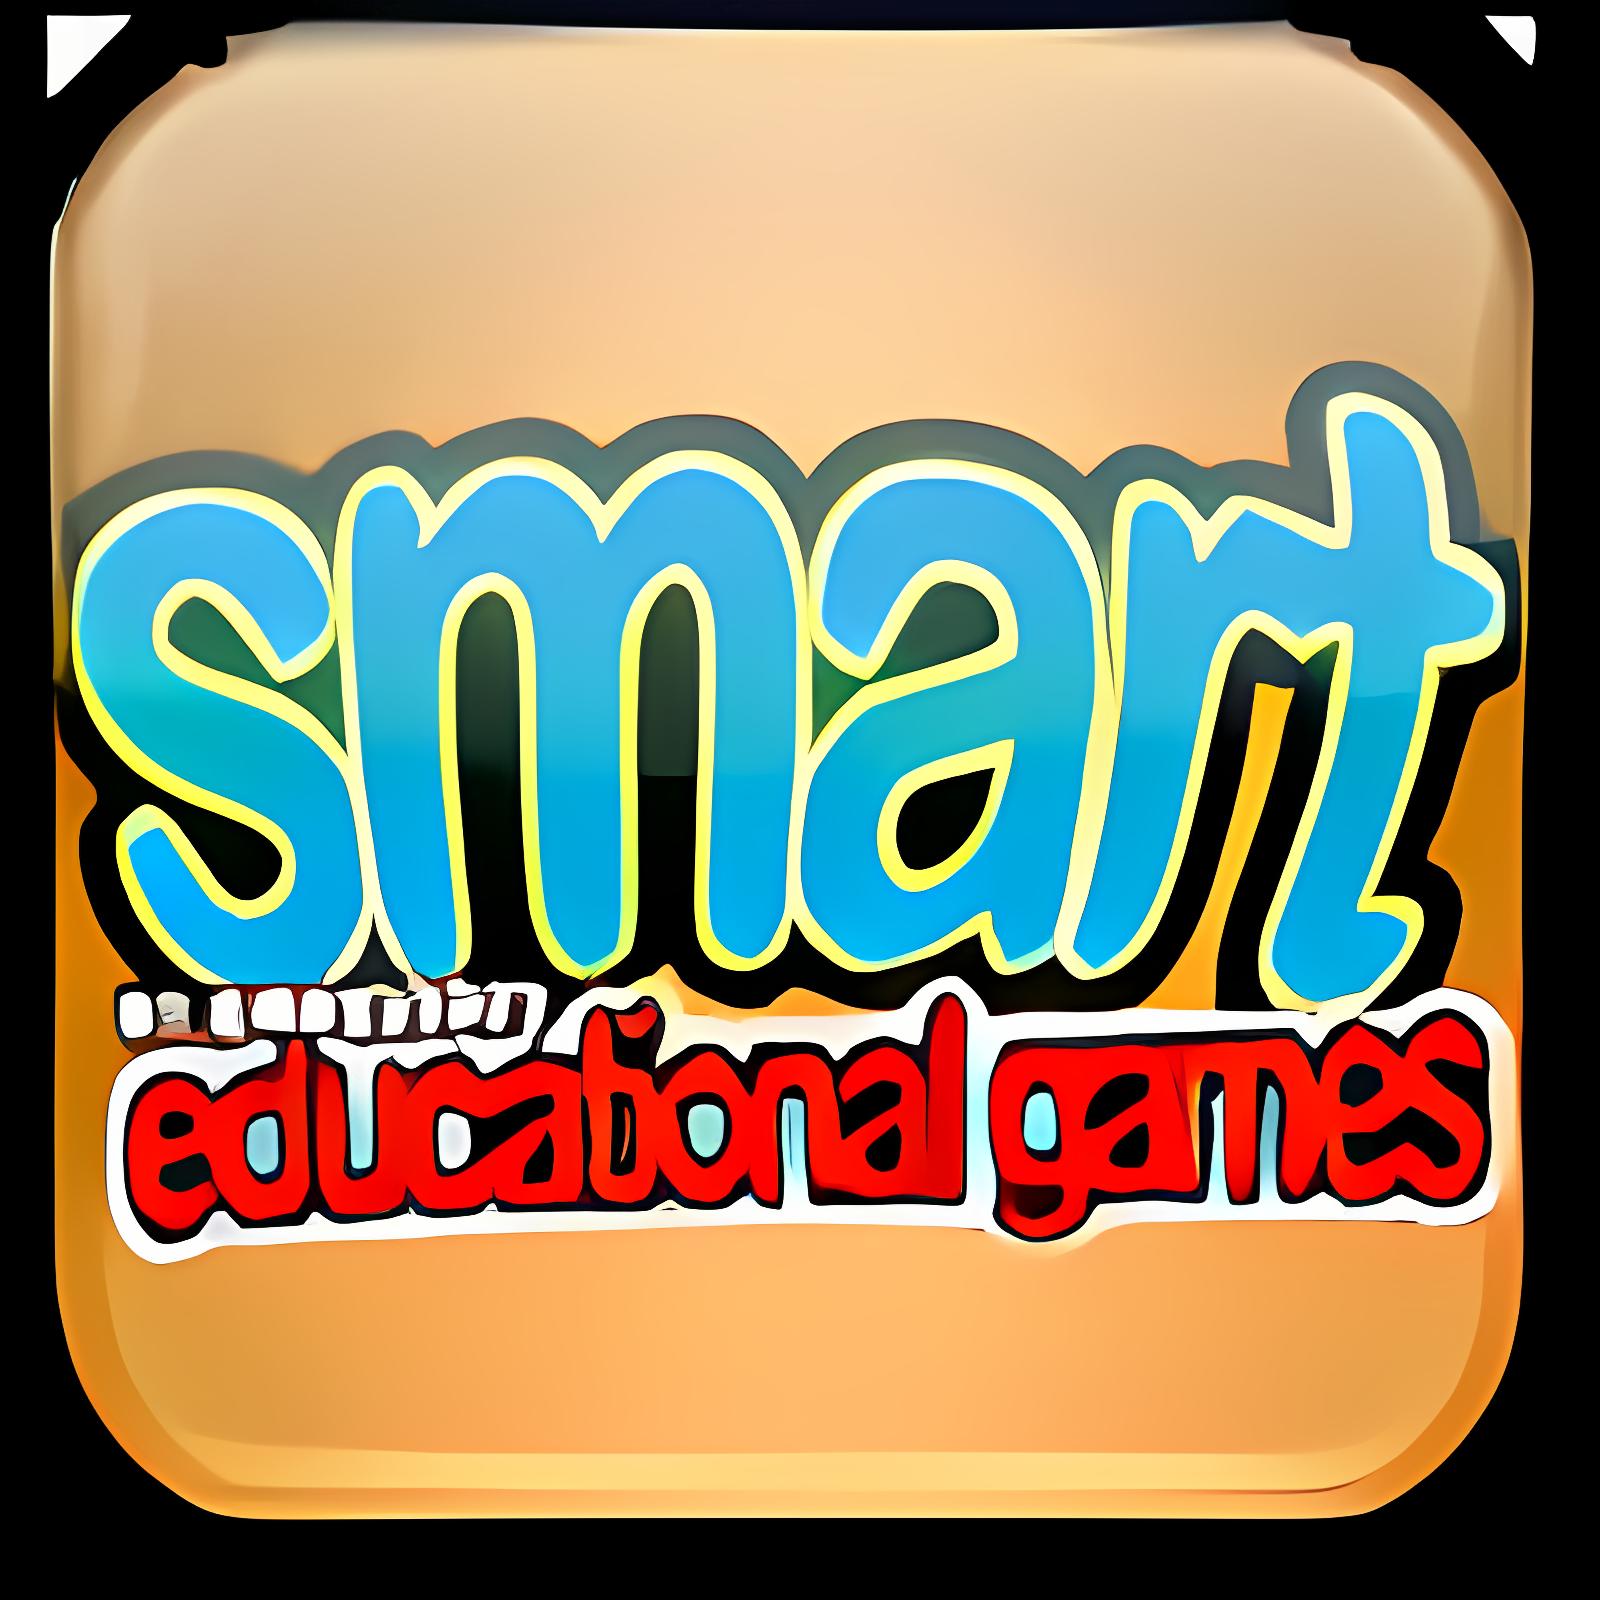 Smart Educational Games